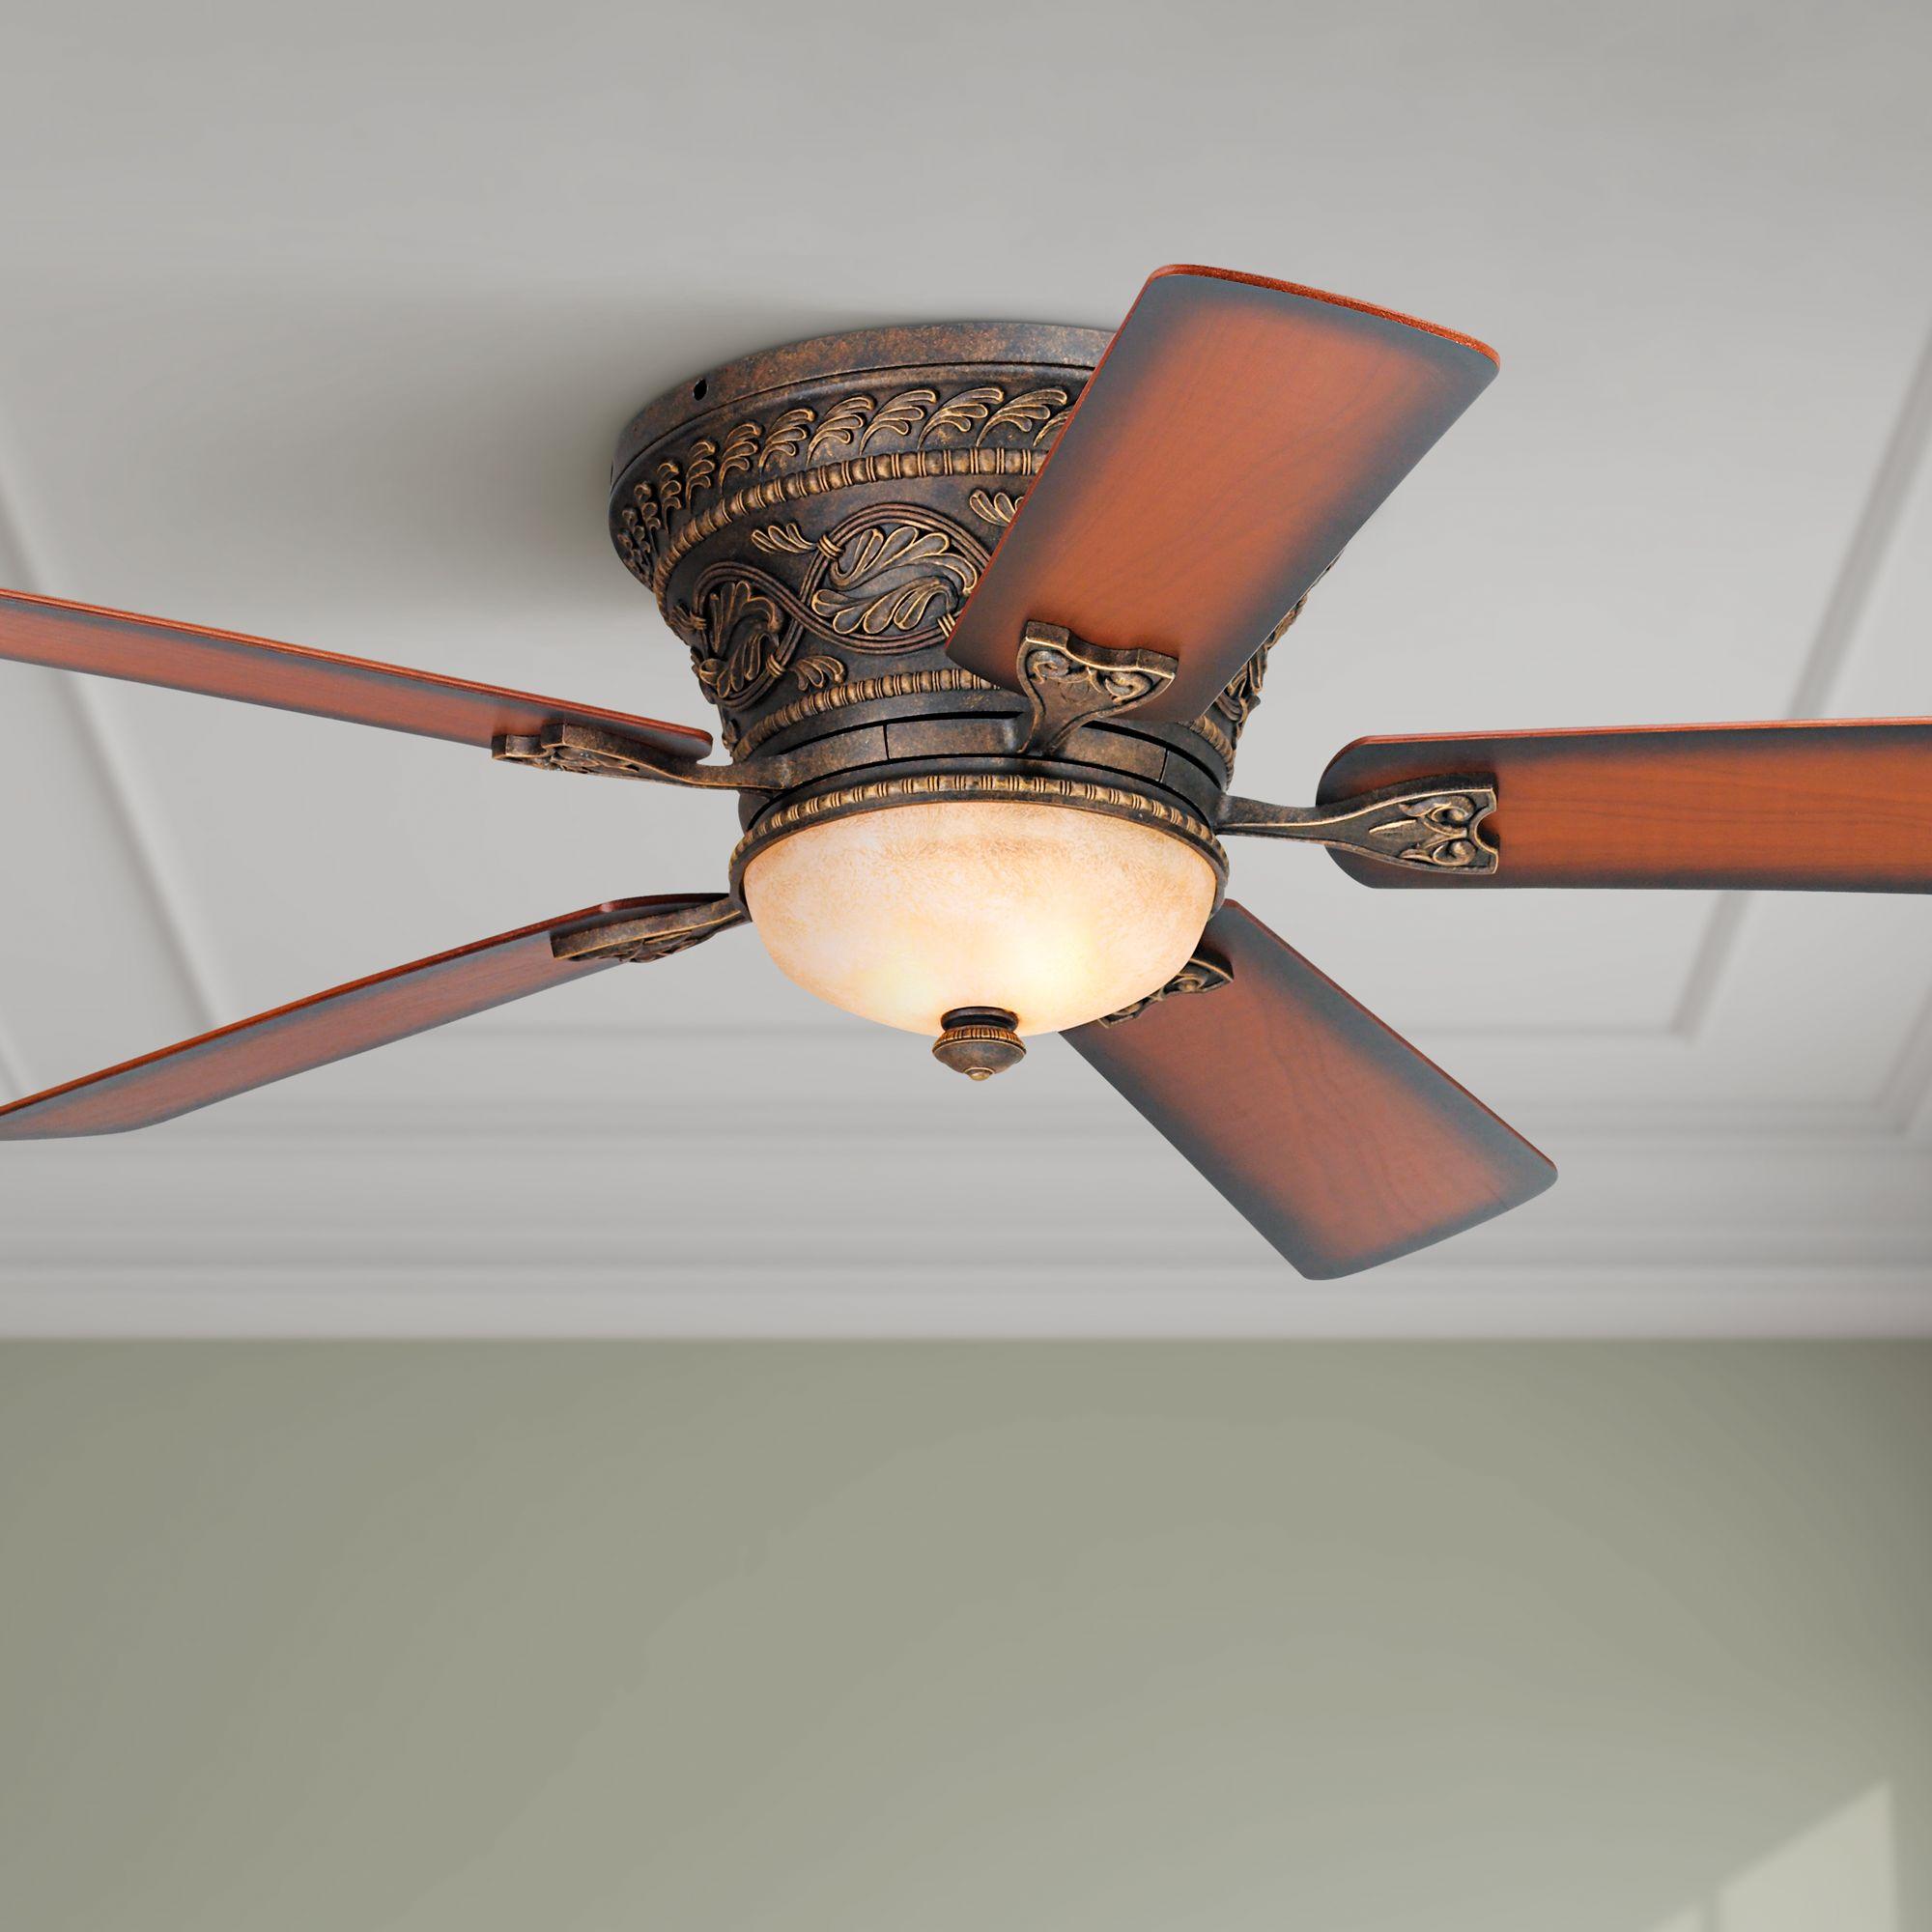 52 Vintage Hugger Ceiling Fan With Light Led Dimmable Remote Bronze Living Room Ebay